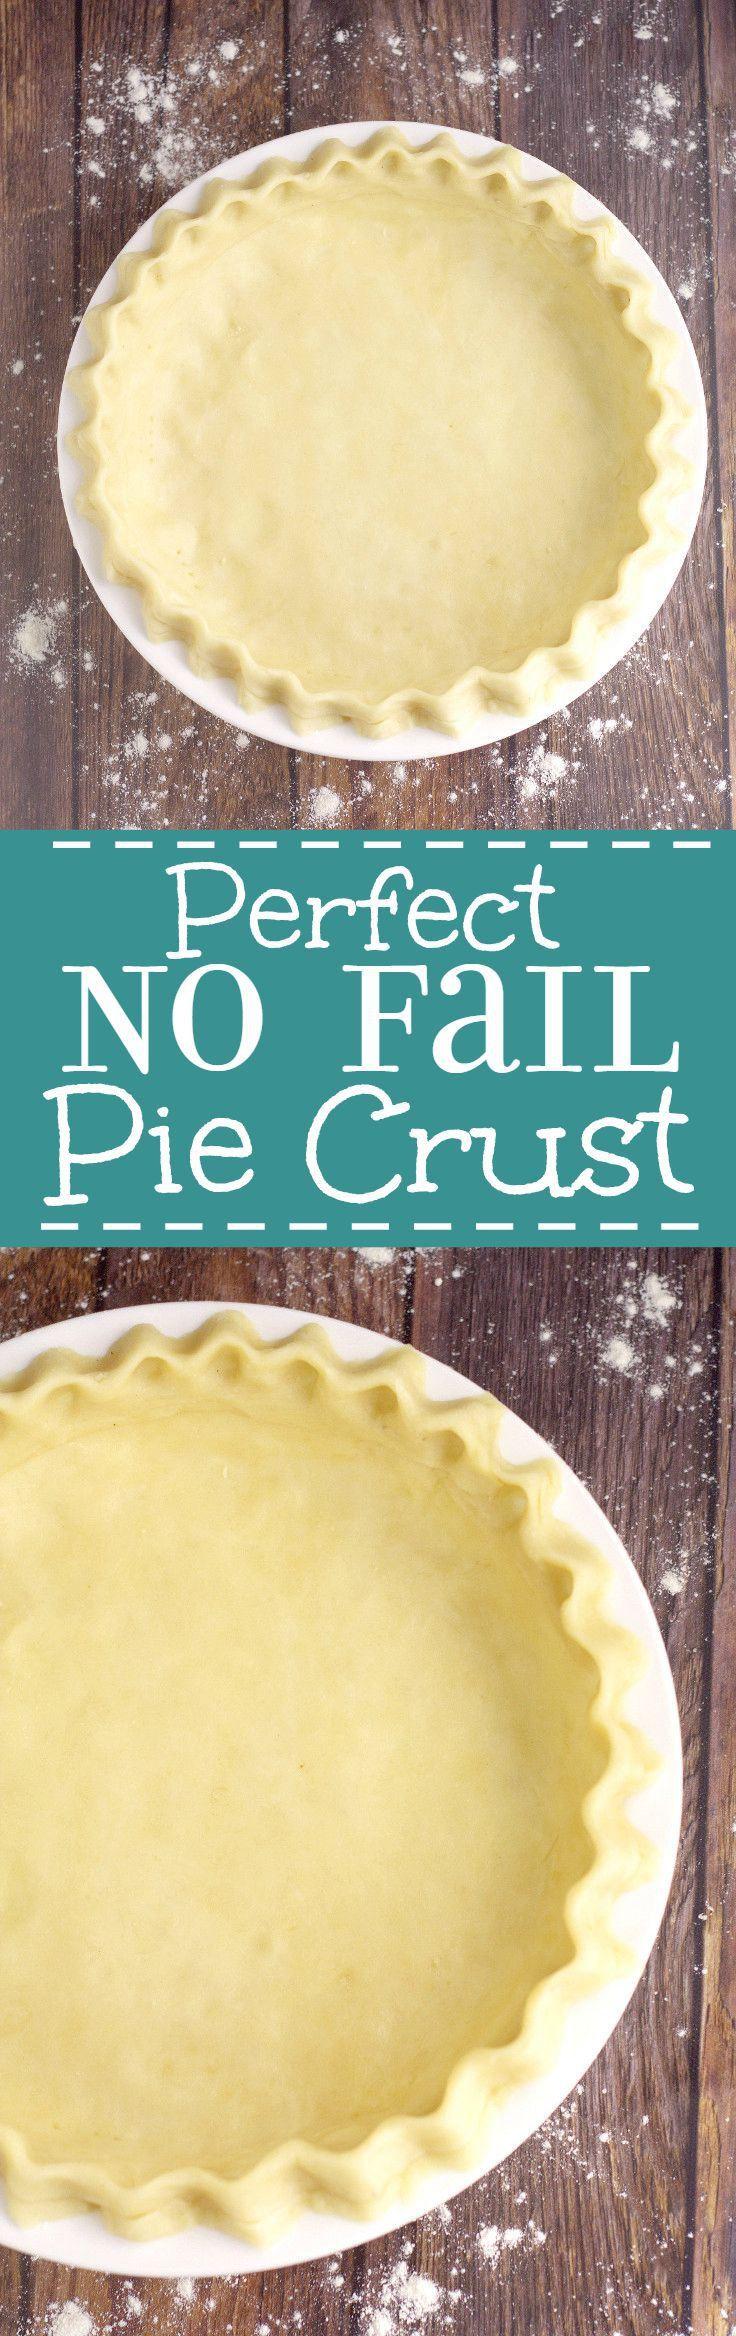 Easy No Fail Pie Crust | Recipe | Pie crust recipes, Crusts and Pies